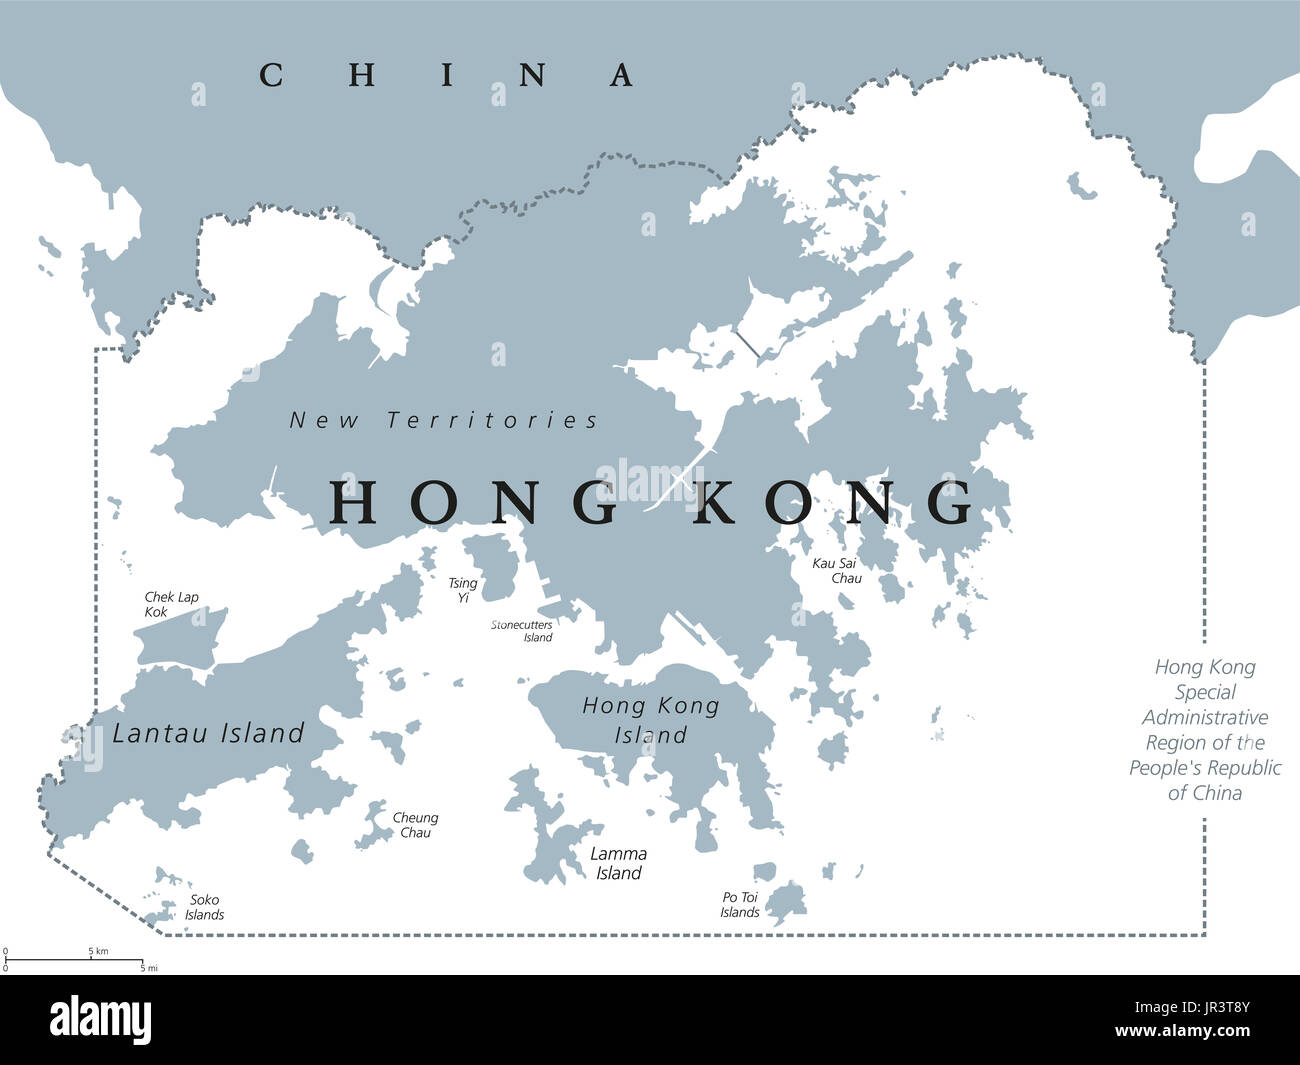 Cartina Hong Kong.Hong Kong Map High Resolution Stock Photography And Images Alamy